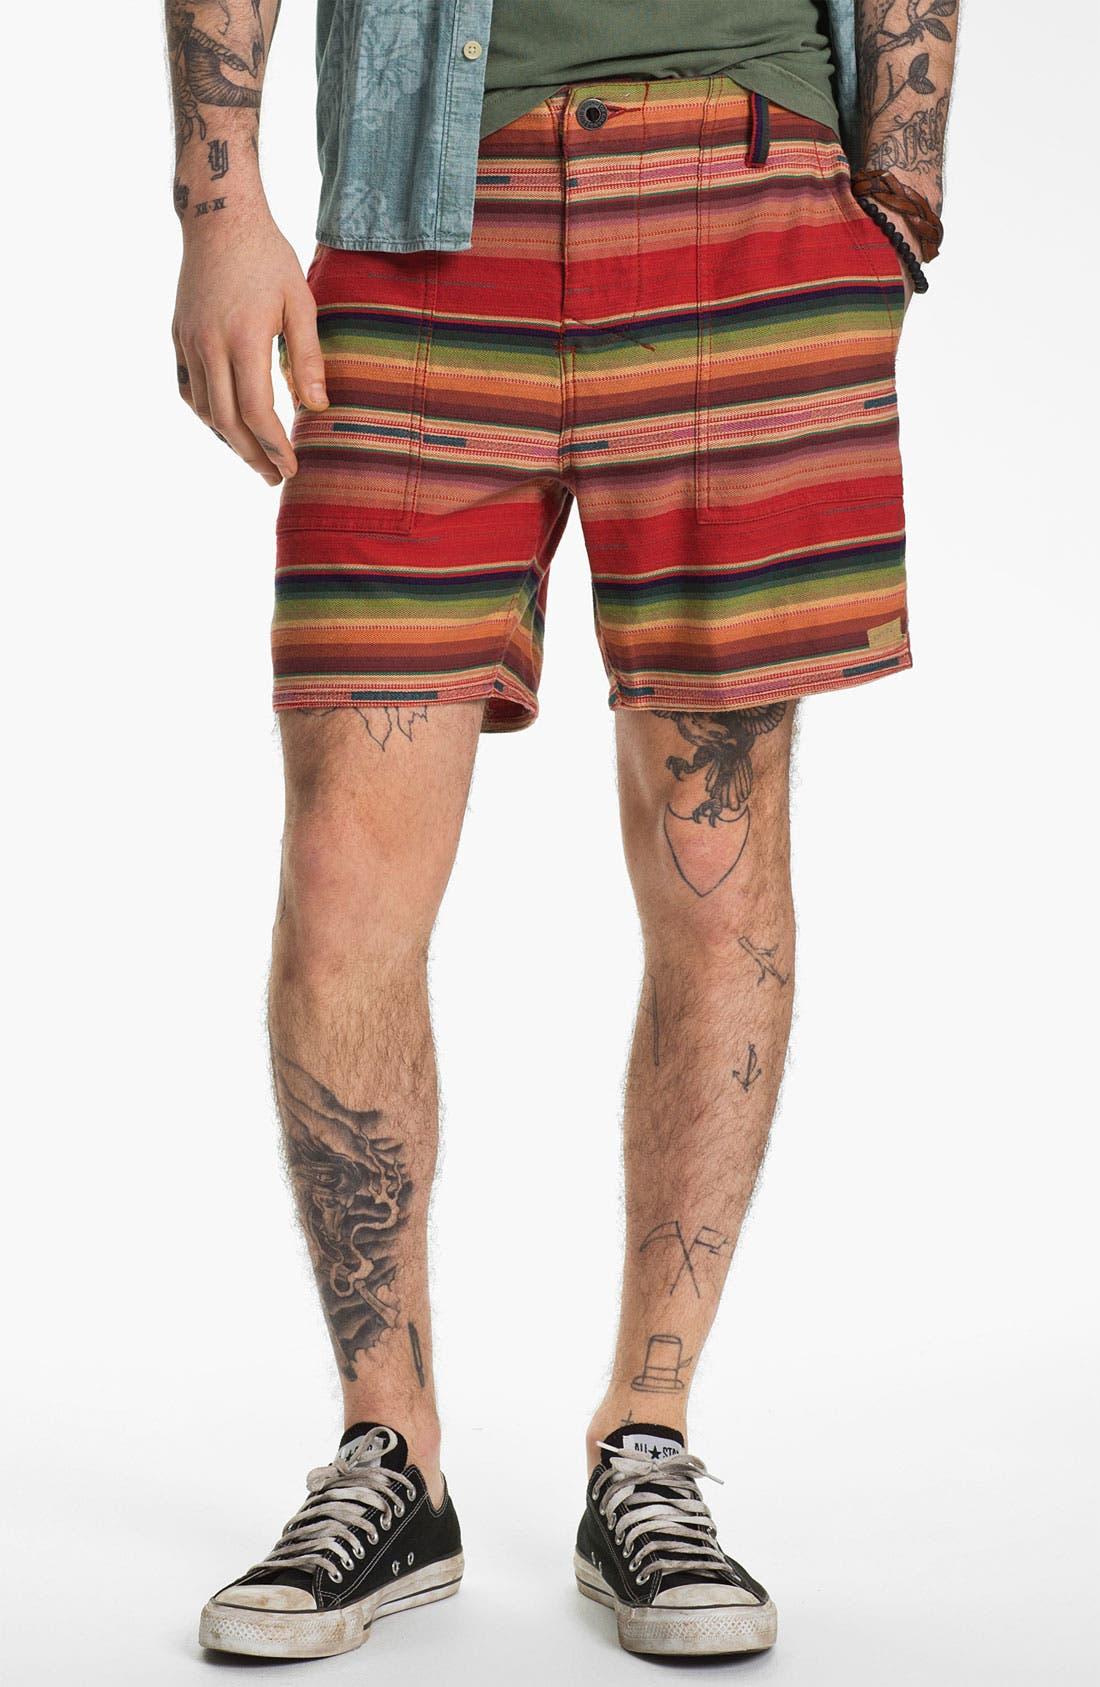 Alternate Image 1 Selected - Rhythm 'Wairoo' Shorts